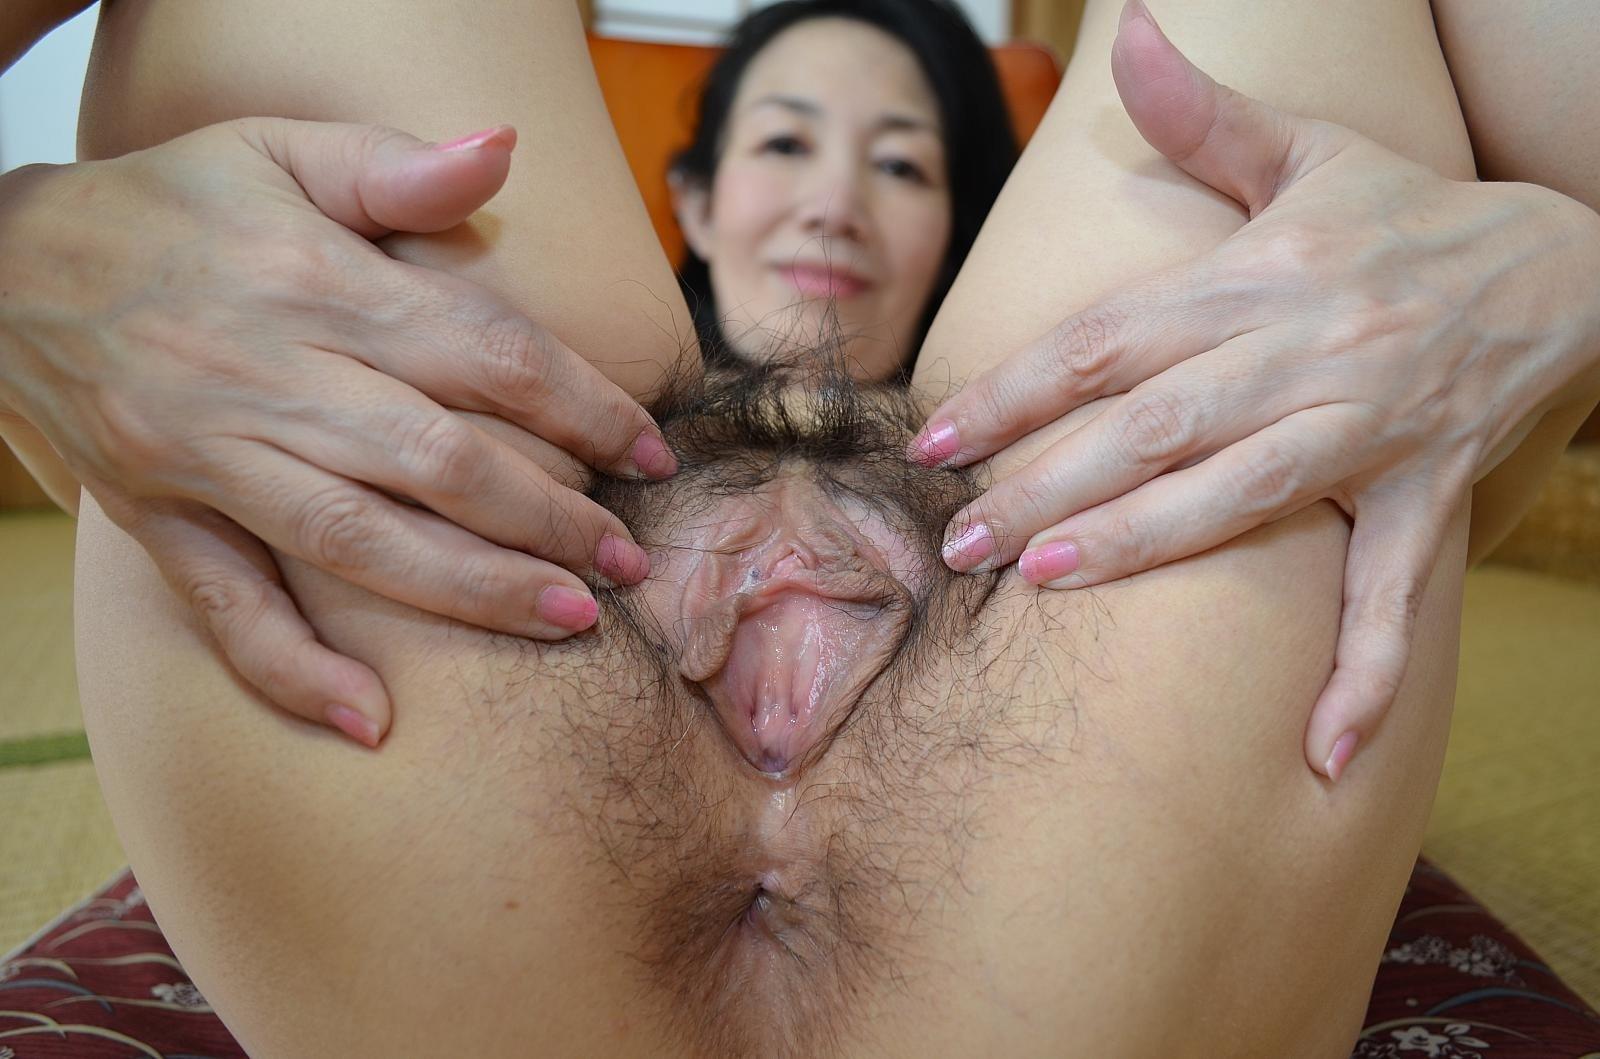 Asian Hairy Mature